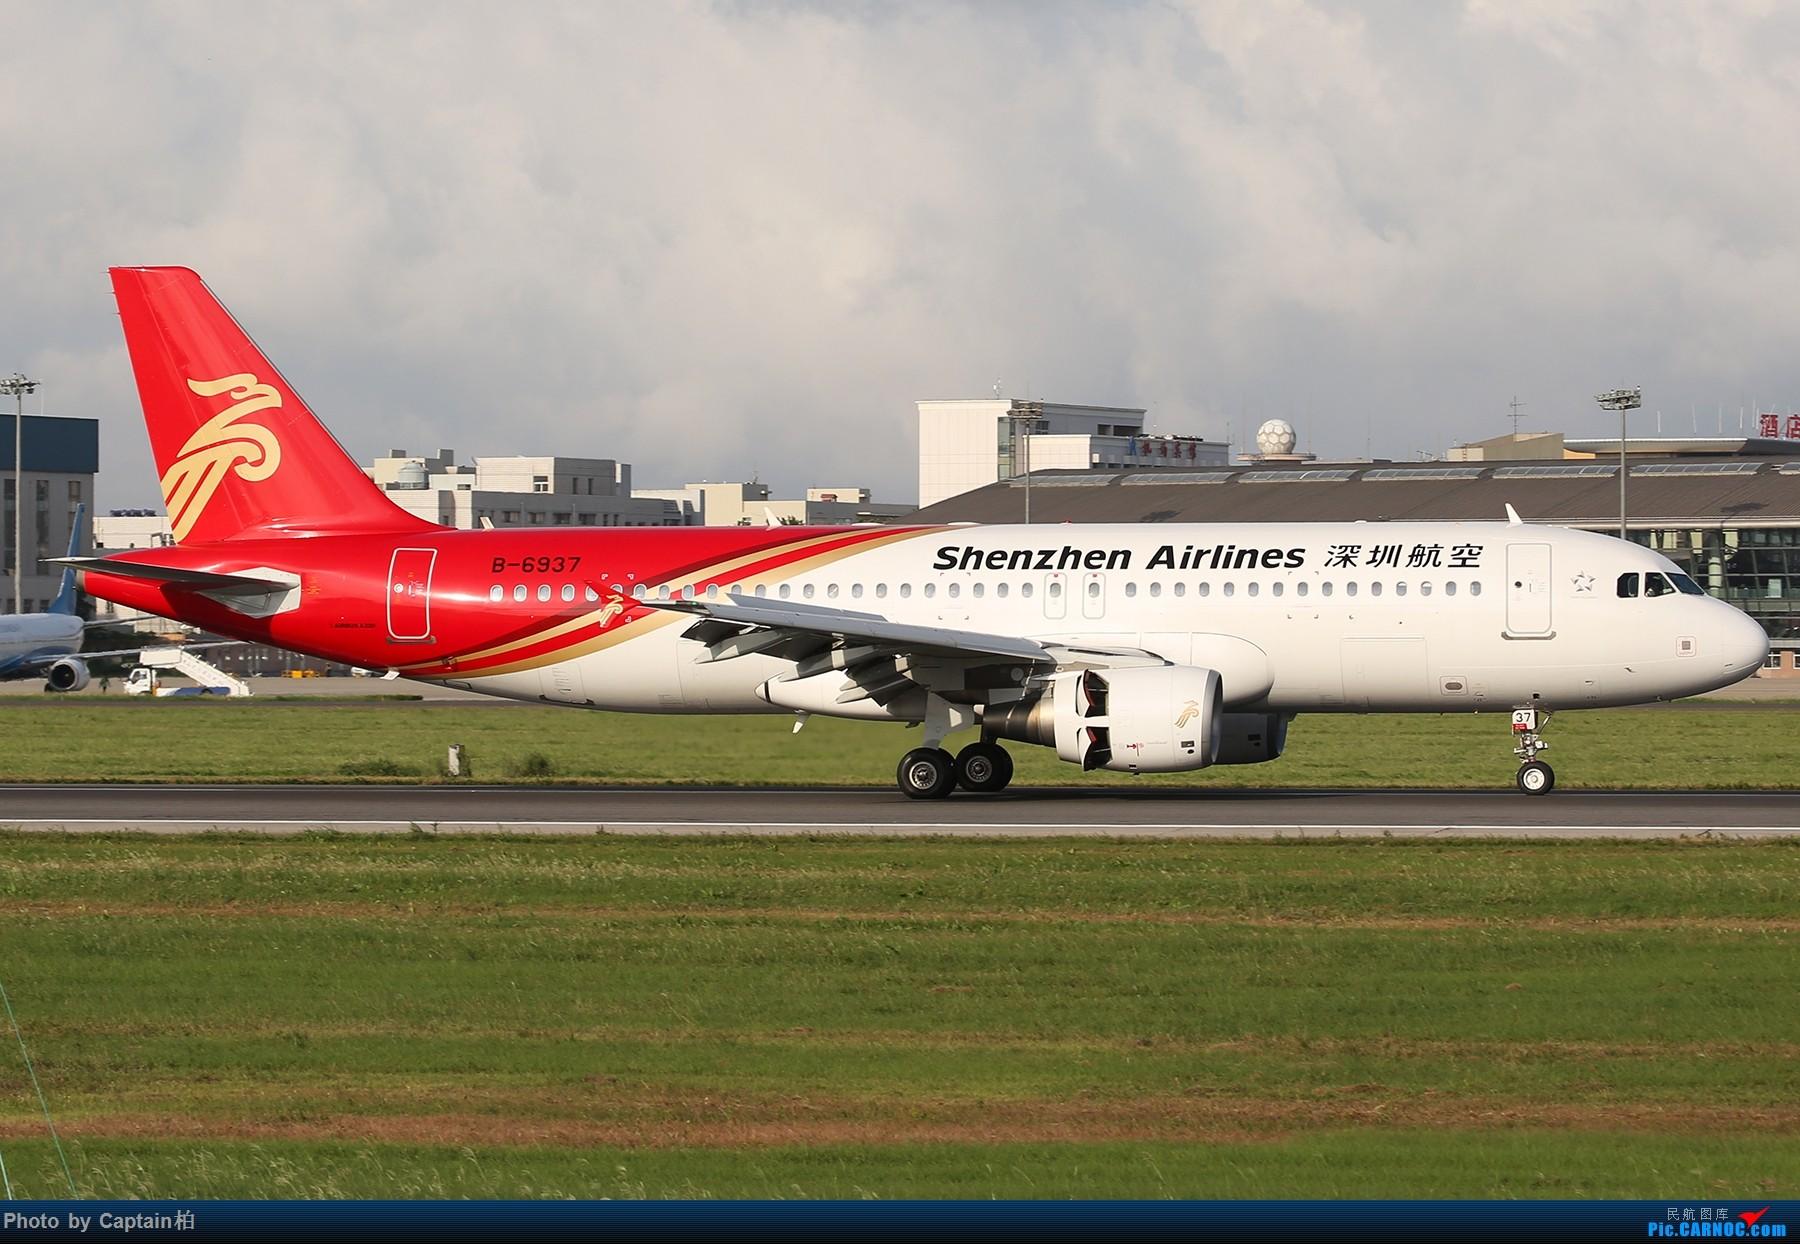 Re:[原创]青岛杂图 AIRBUS A320-200 B-6937 中国青岛流亭国际机场